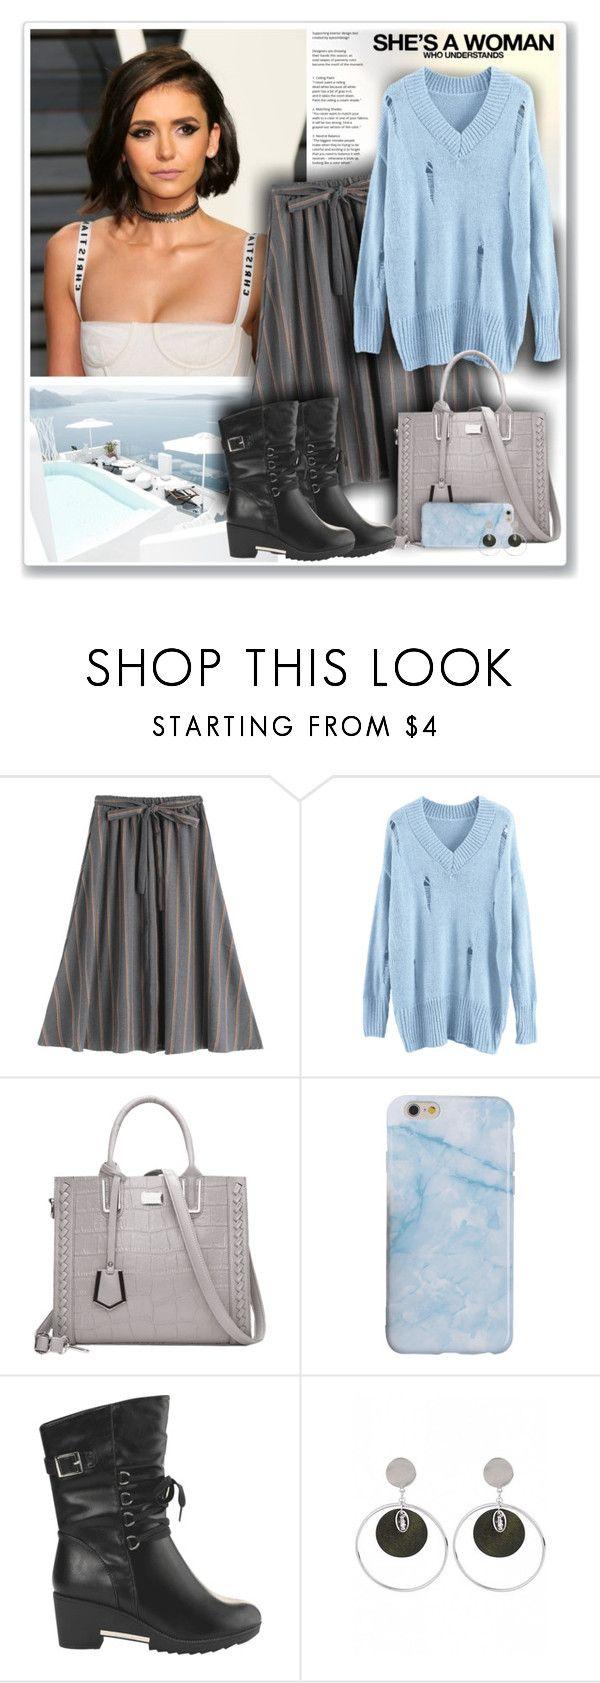 """Z Fashion266"" by sneky ❤ liked on Polyvore"